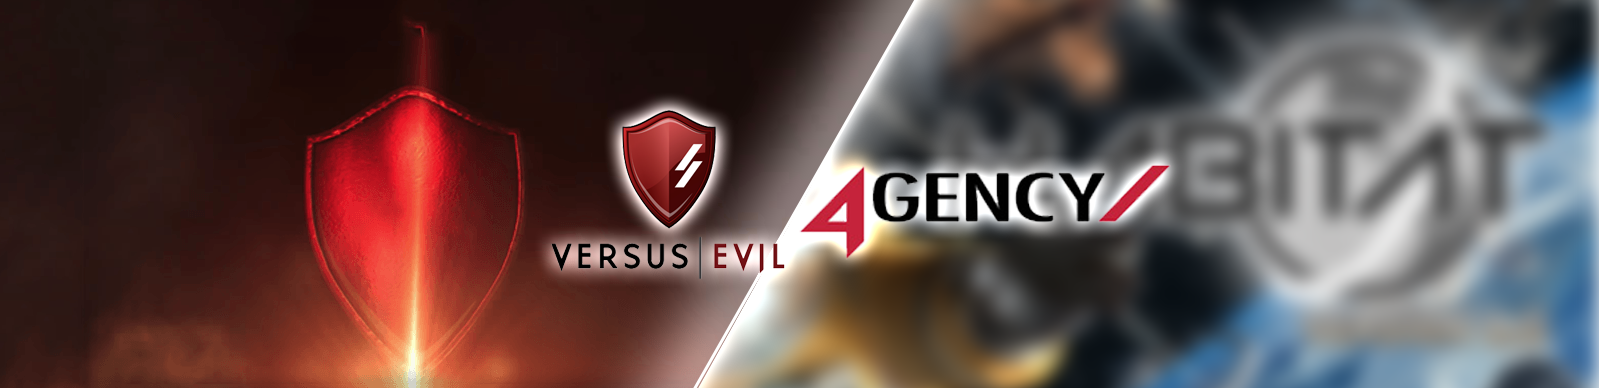 Versus Evil Partners with 4gency